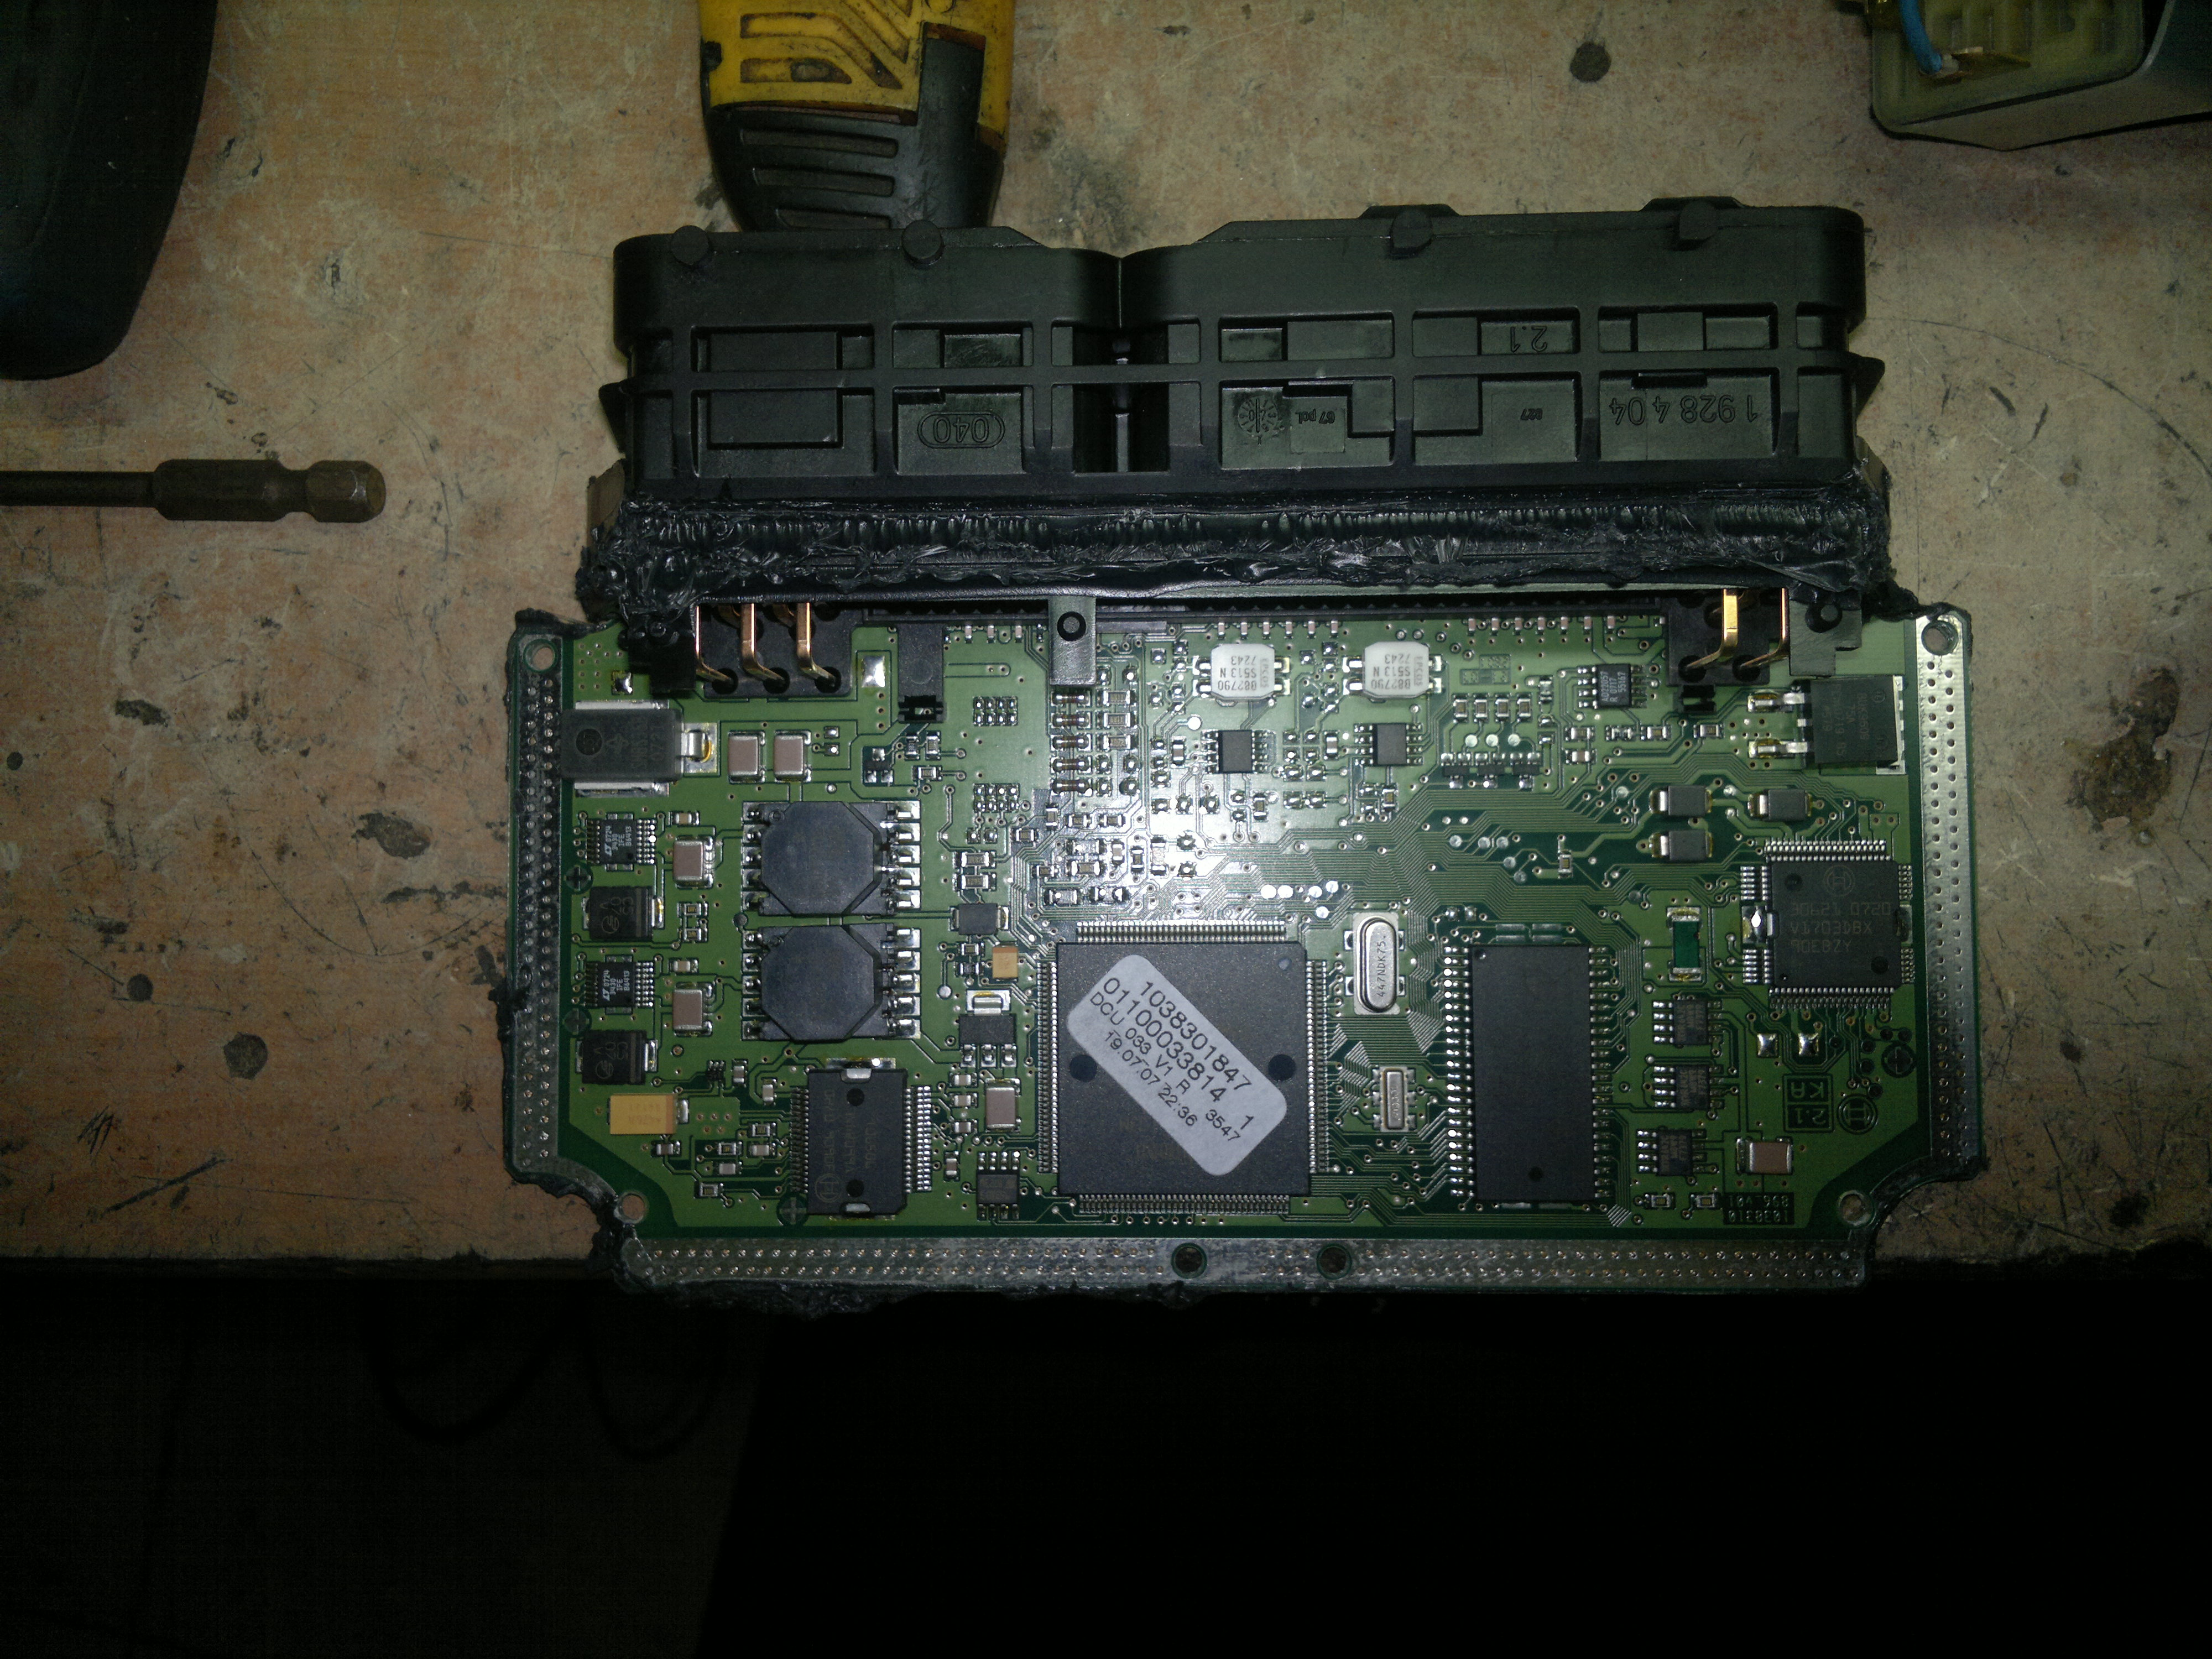 Man Tga - Programowanie Adblue